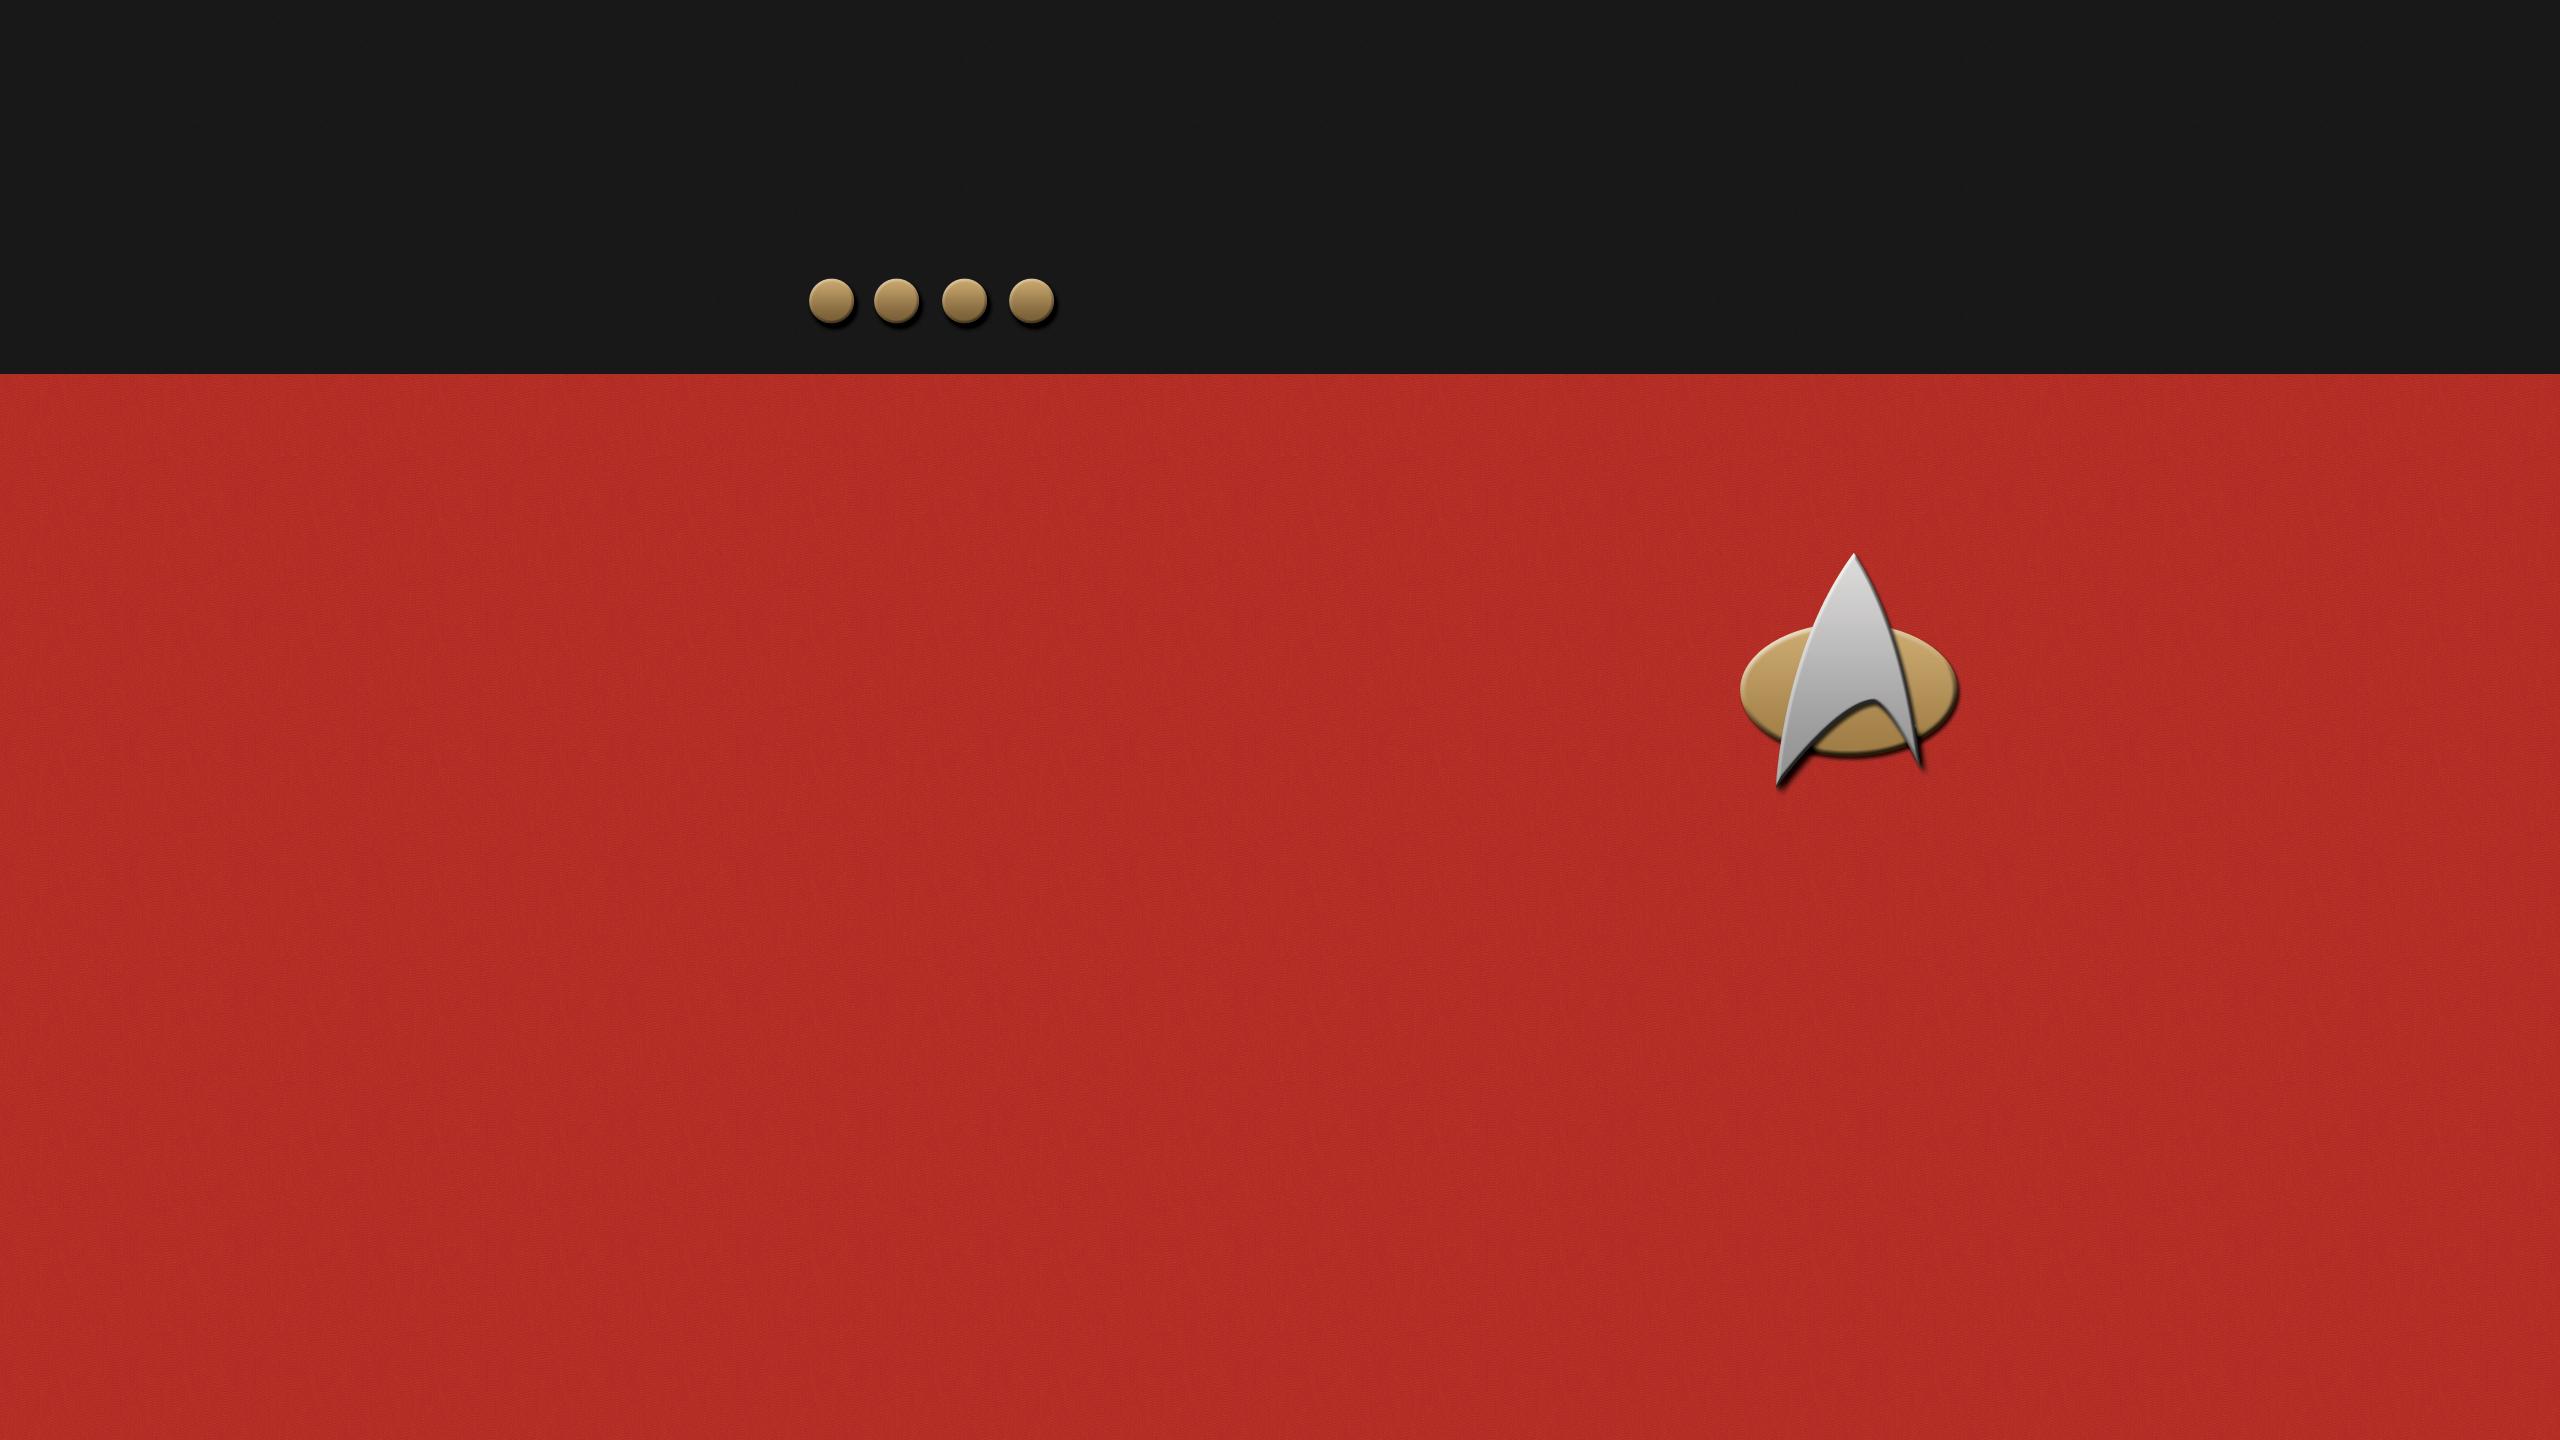 Star Trek Picard Wallpaper 2560x1440 Phone Wallpaper Star Trek Printables Wallpaper